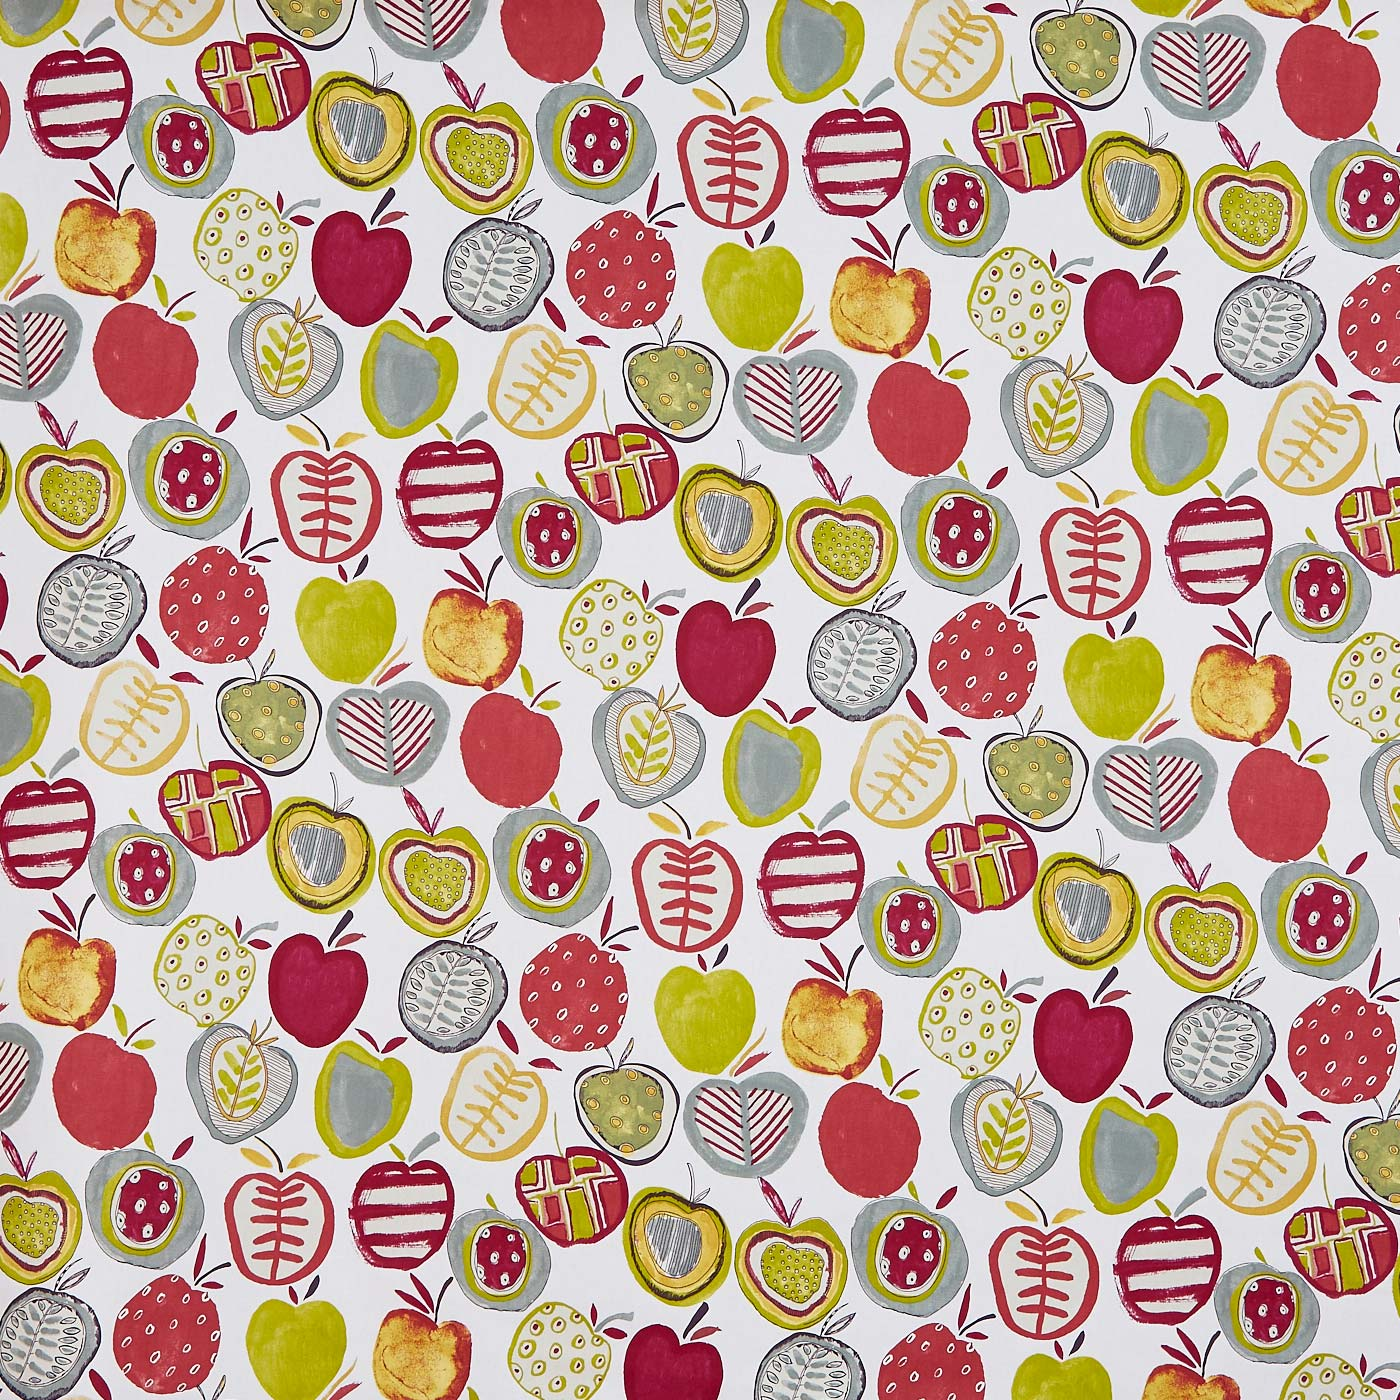 Apples Berry